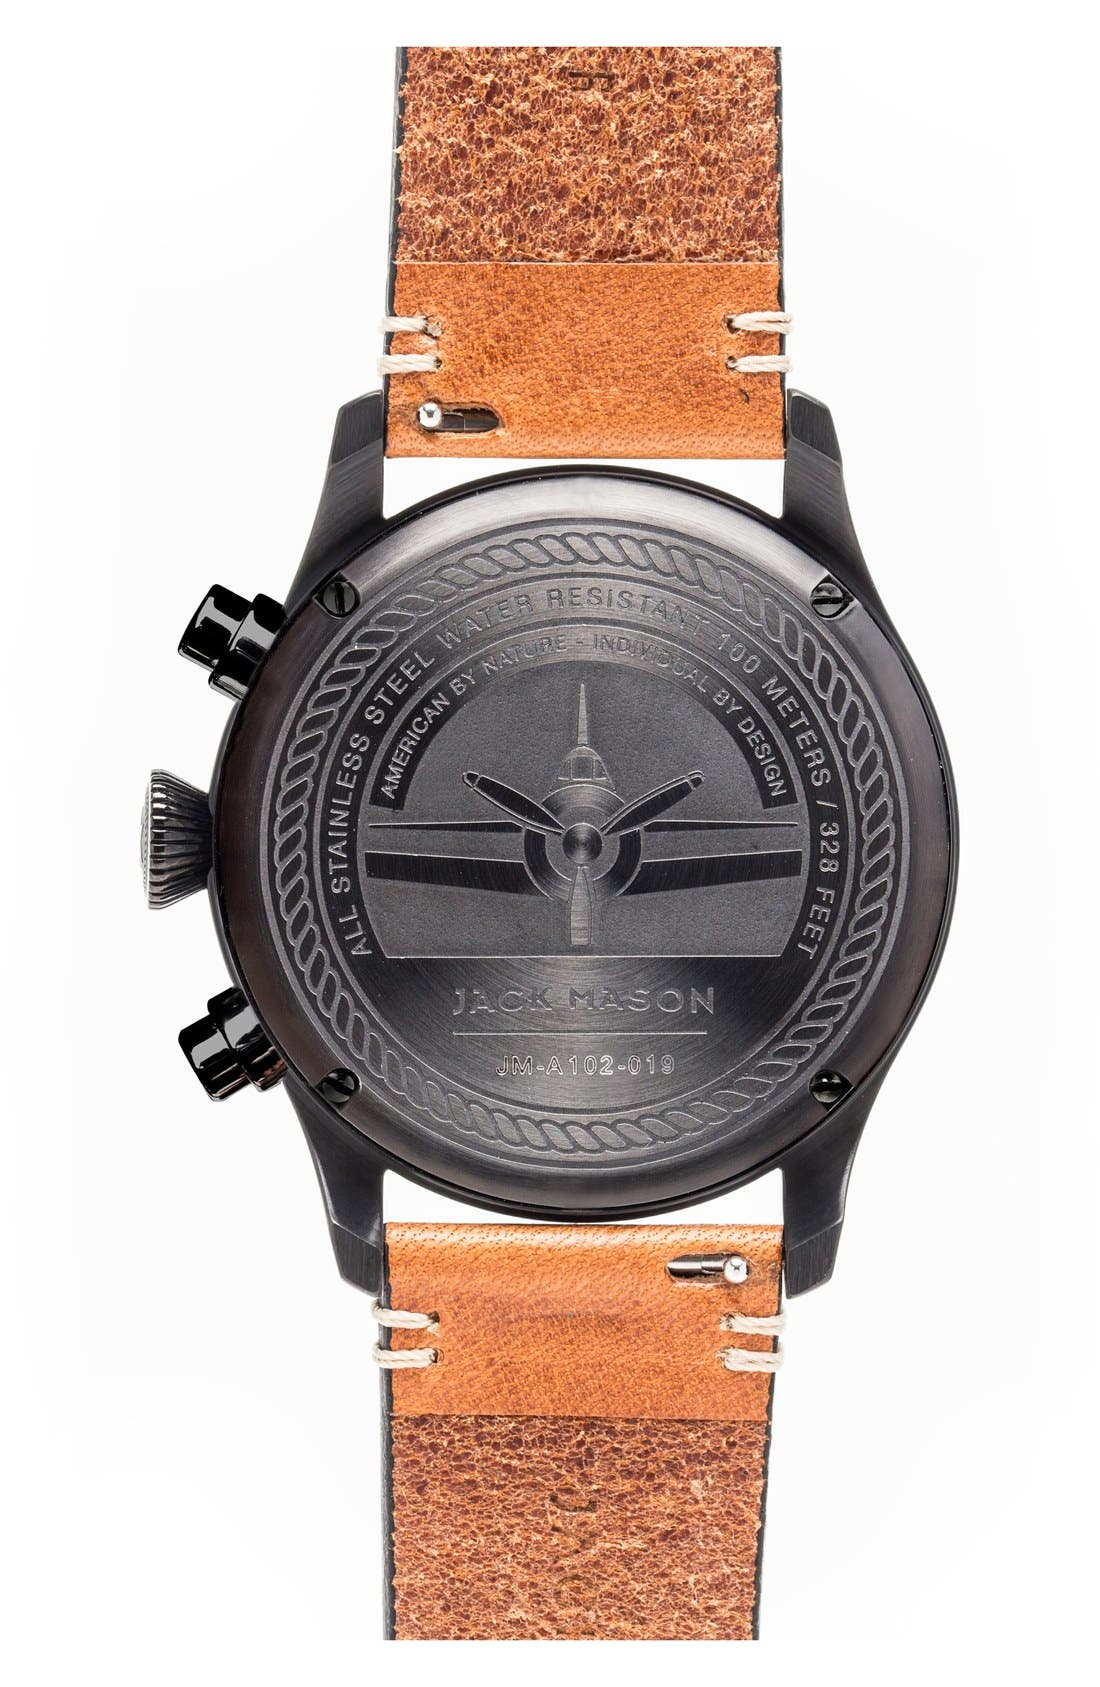 Alternate Image 2  - Jack Mason Chronograph Leather Strap Watch, 42mm